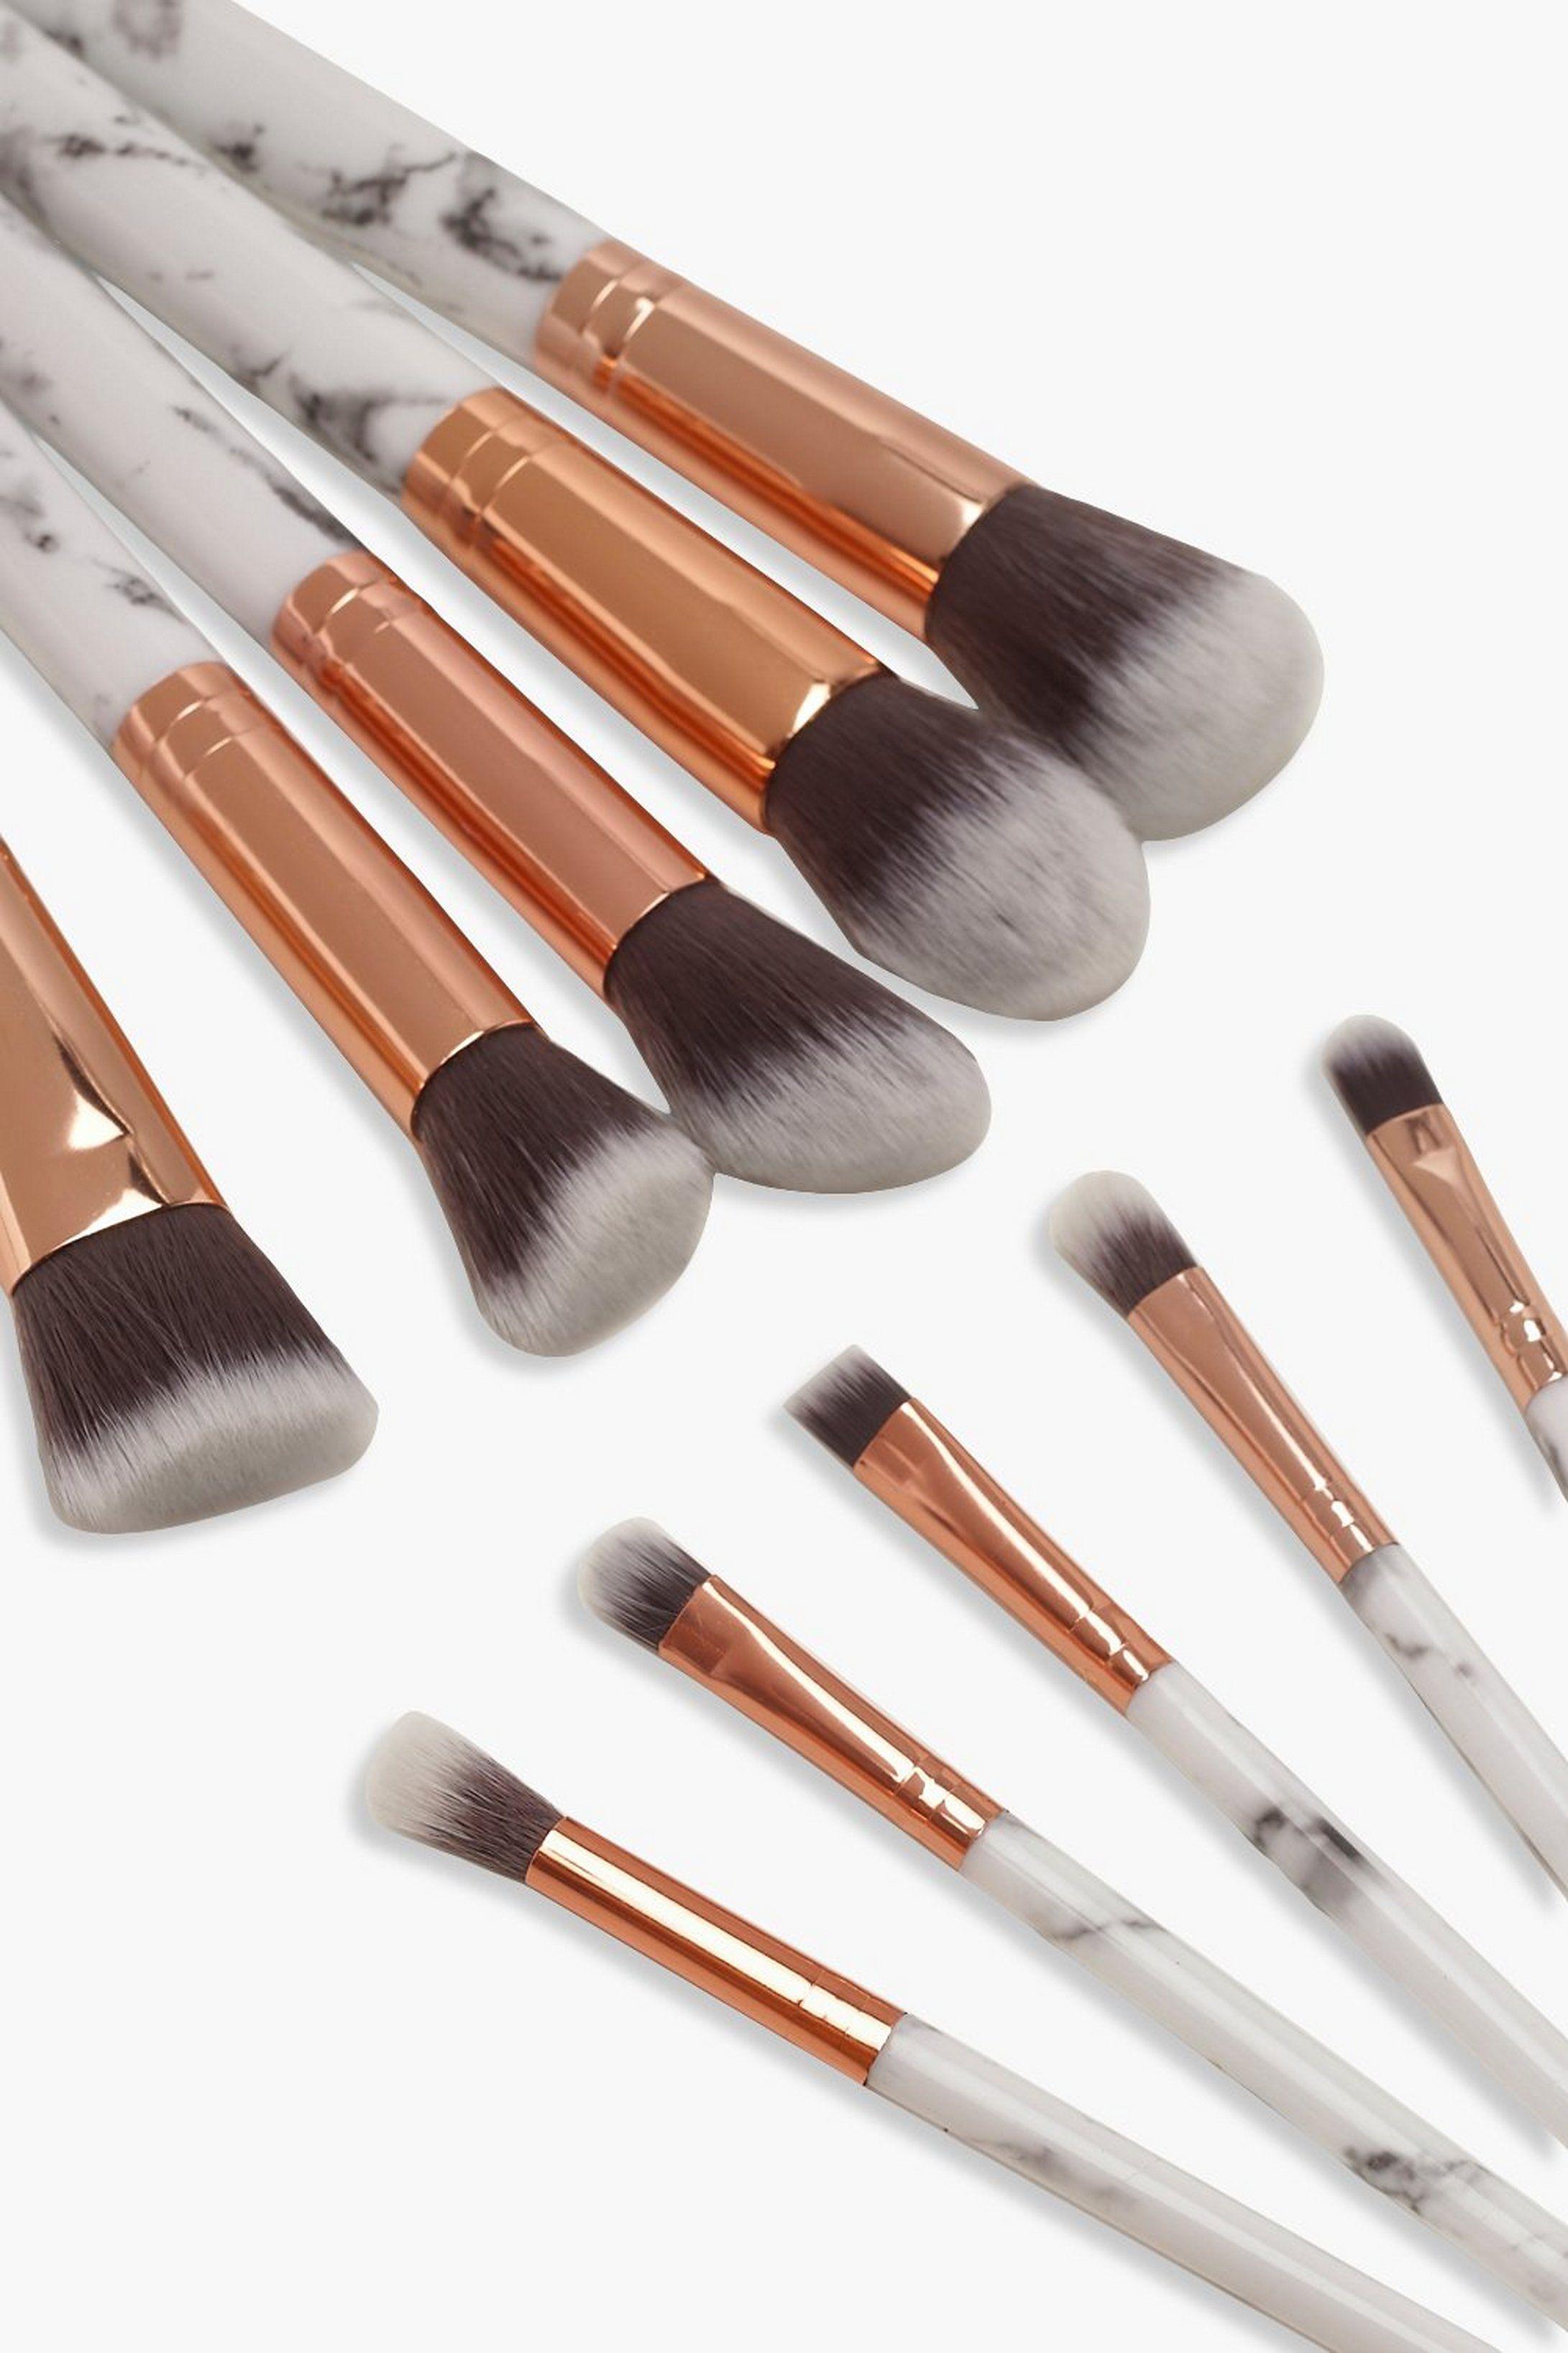 10 Piece Rose Gold Marble Make Up Brush Set Boohoo In 2020 Makeup Brush Set Rose Gold Brushes Makeup Brushes